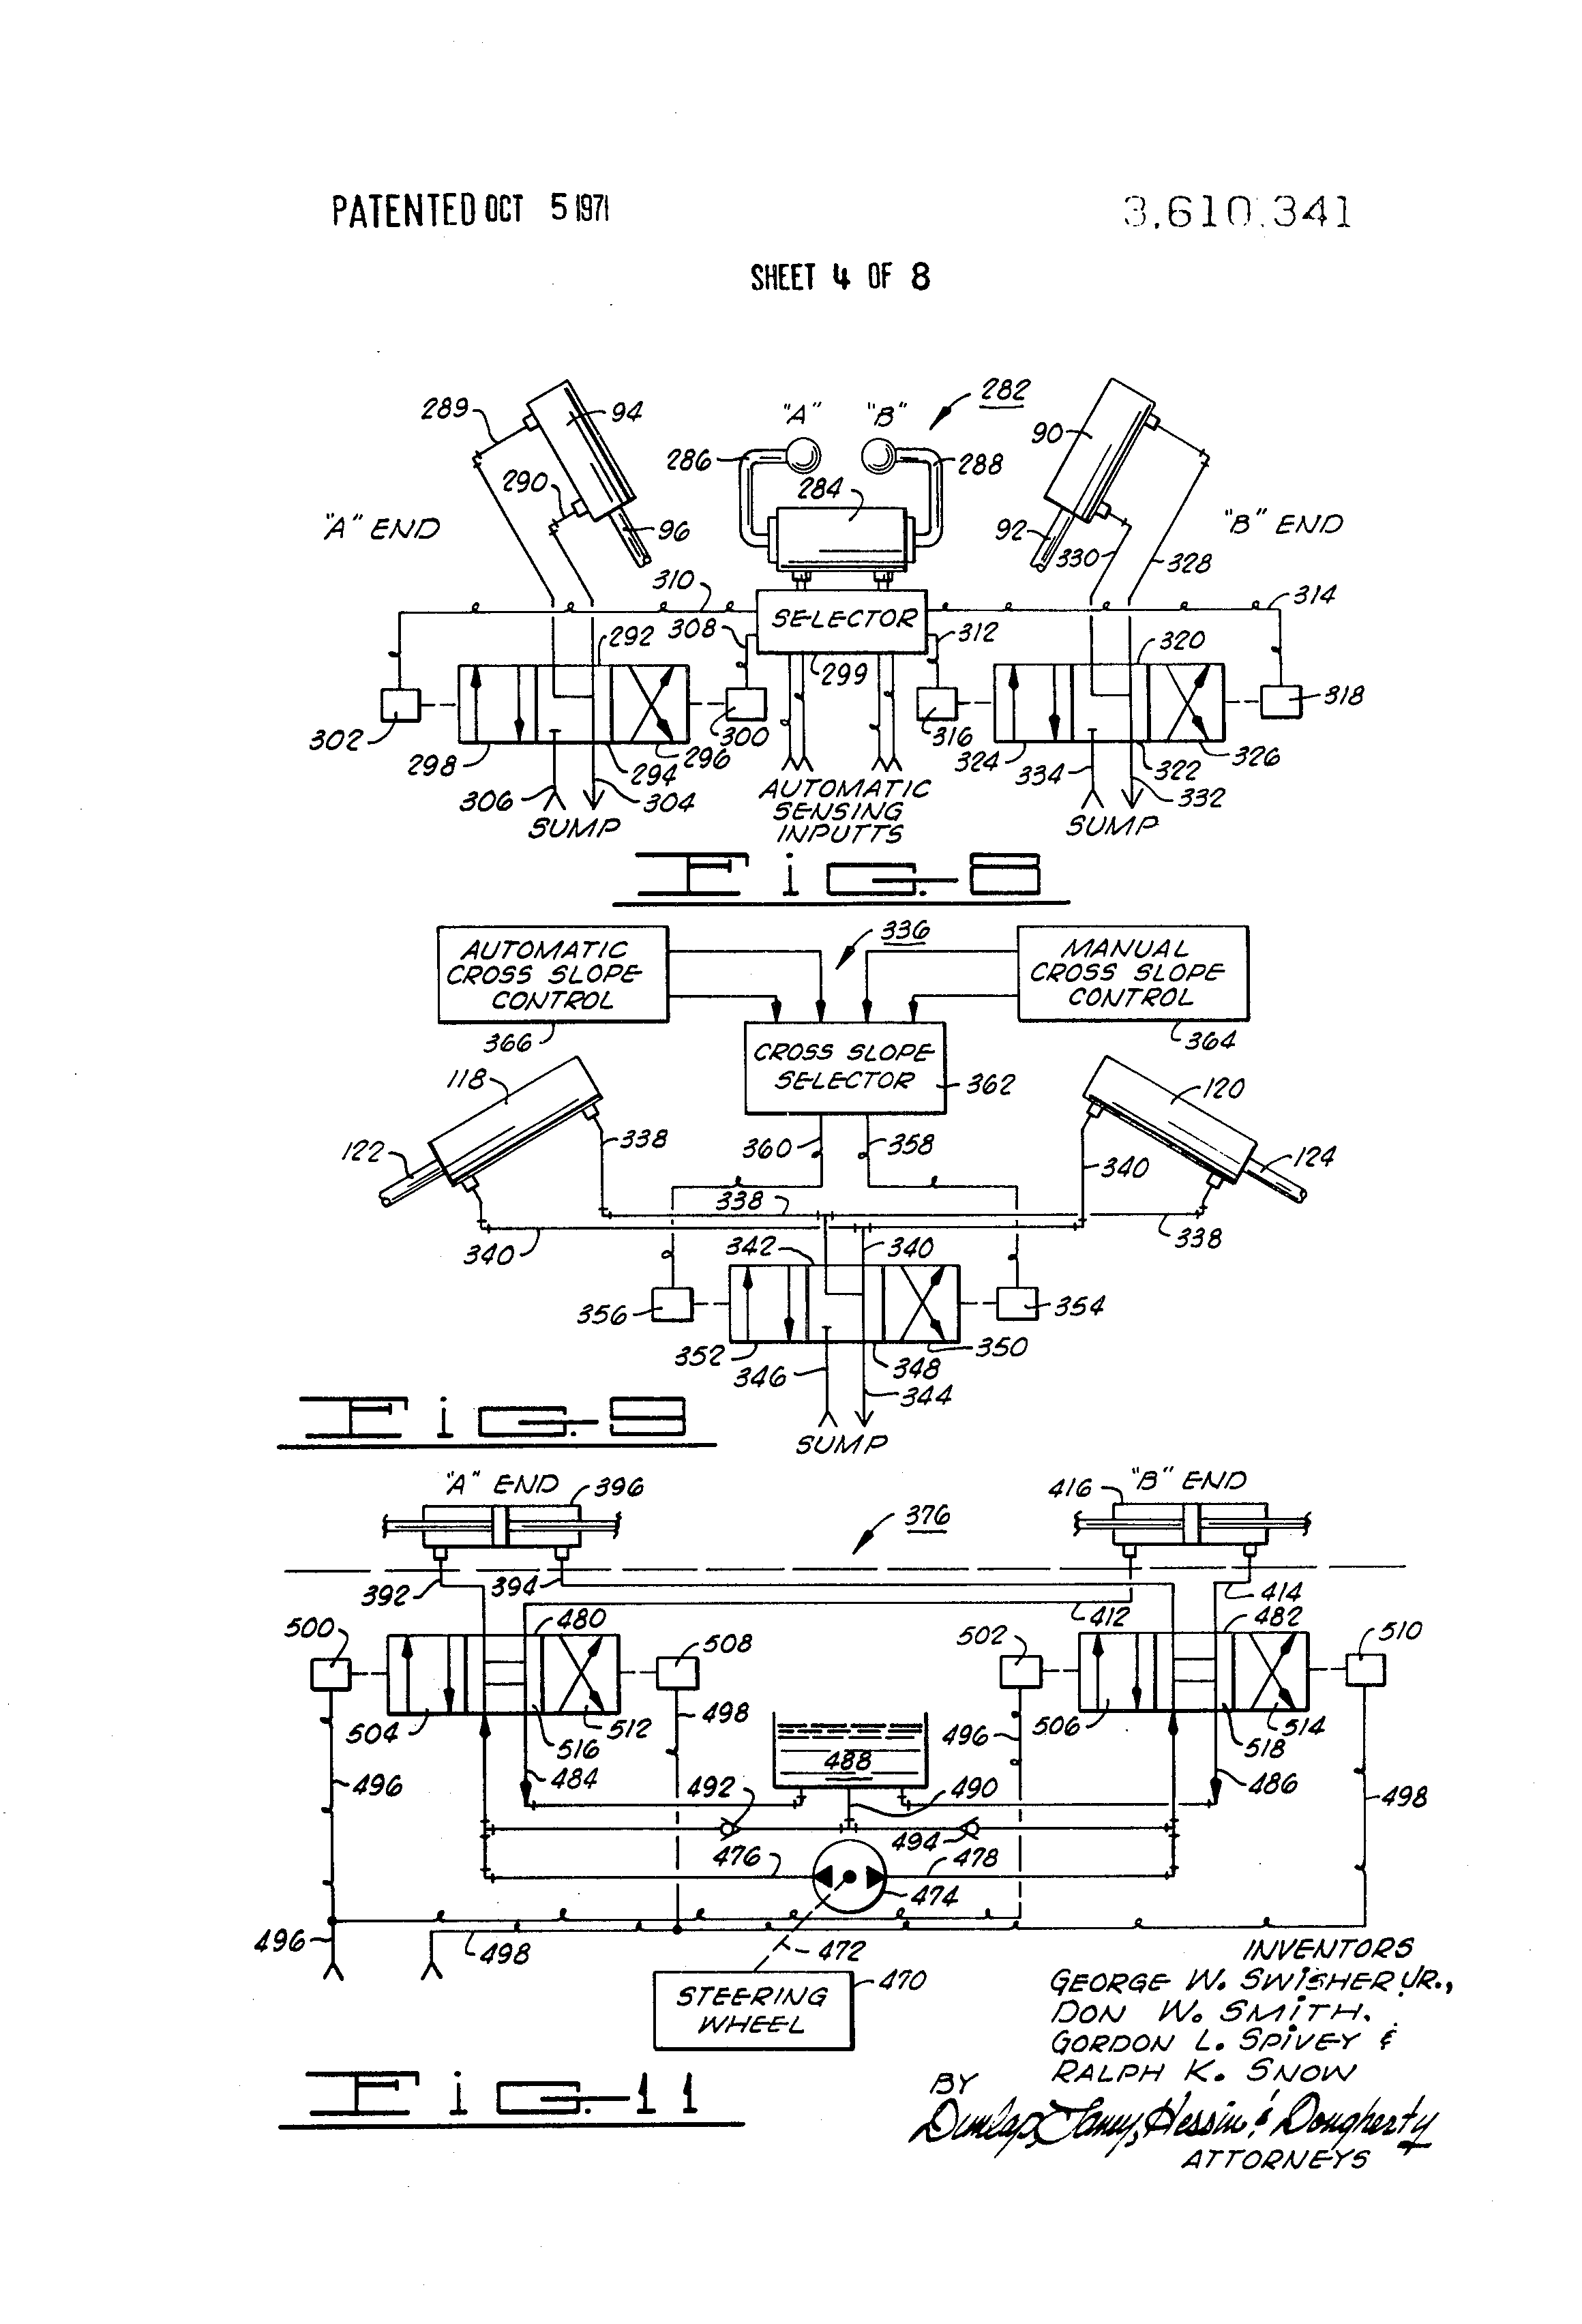 Ih Tractor Wiring Diagram Transmission - Wiring Diagrams Databasediamondcarservice.it